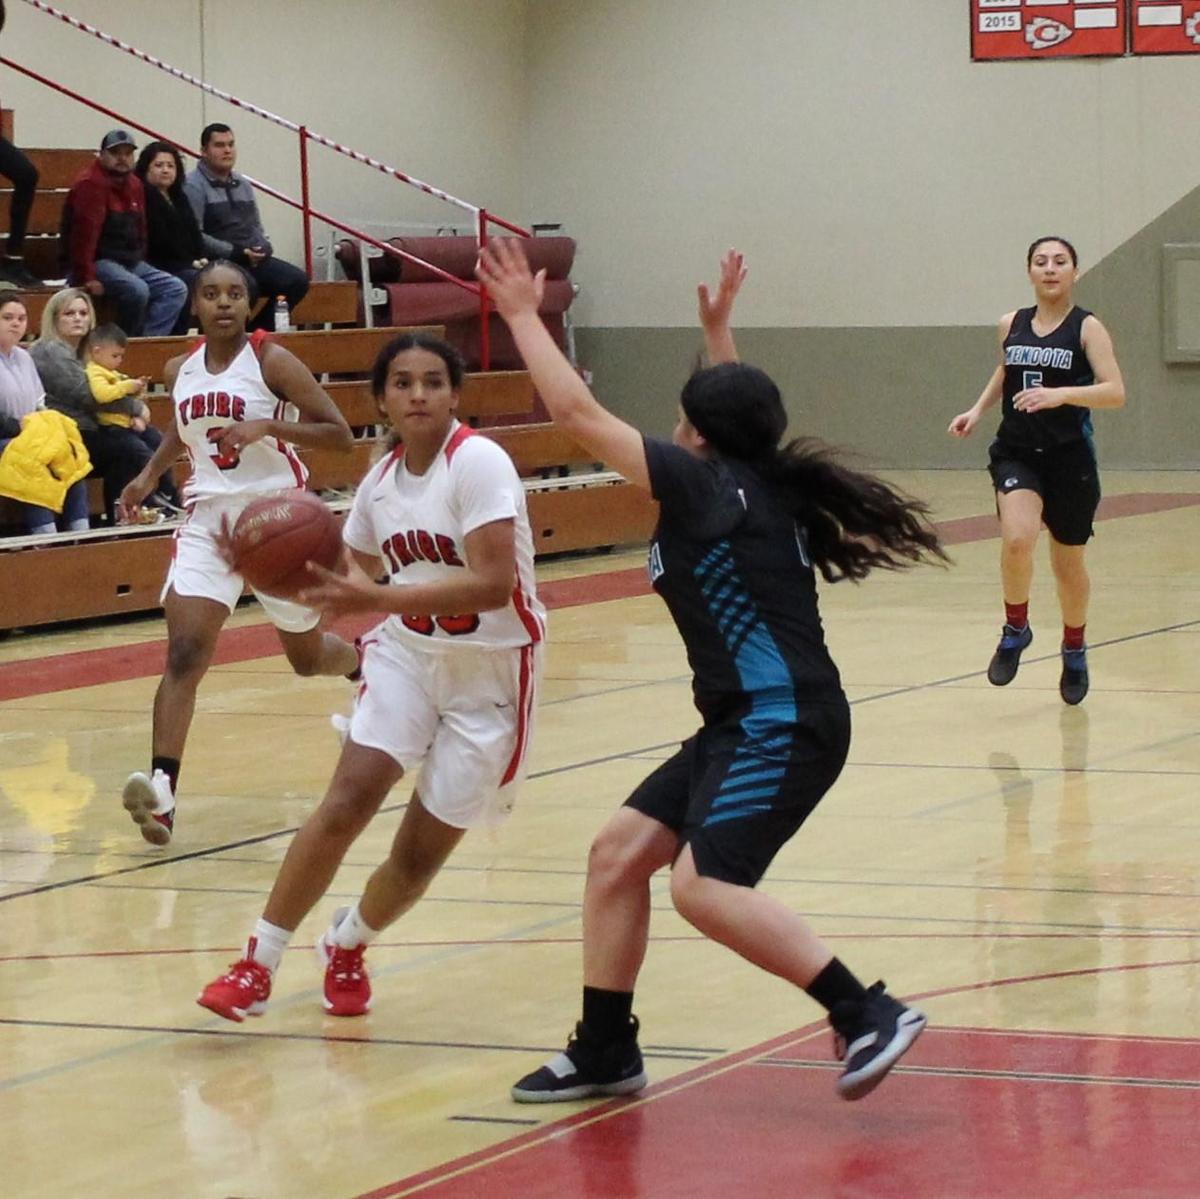 girls playing basketball against Mendota